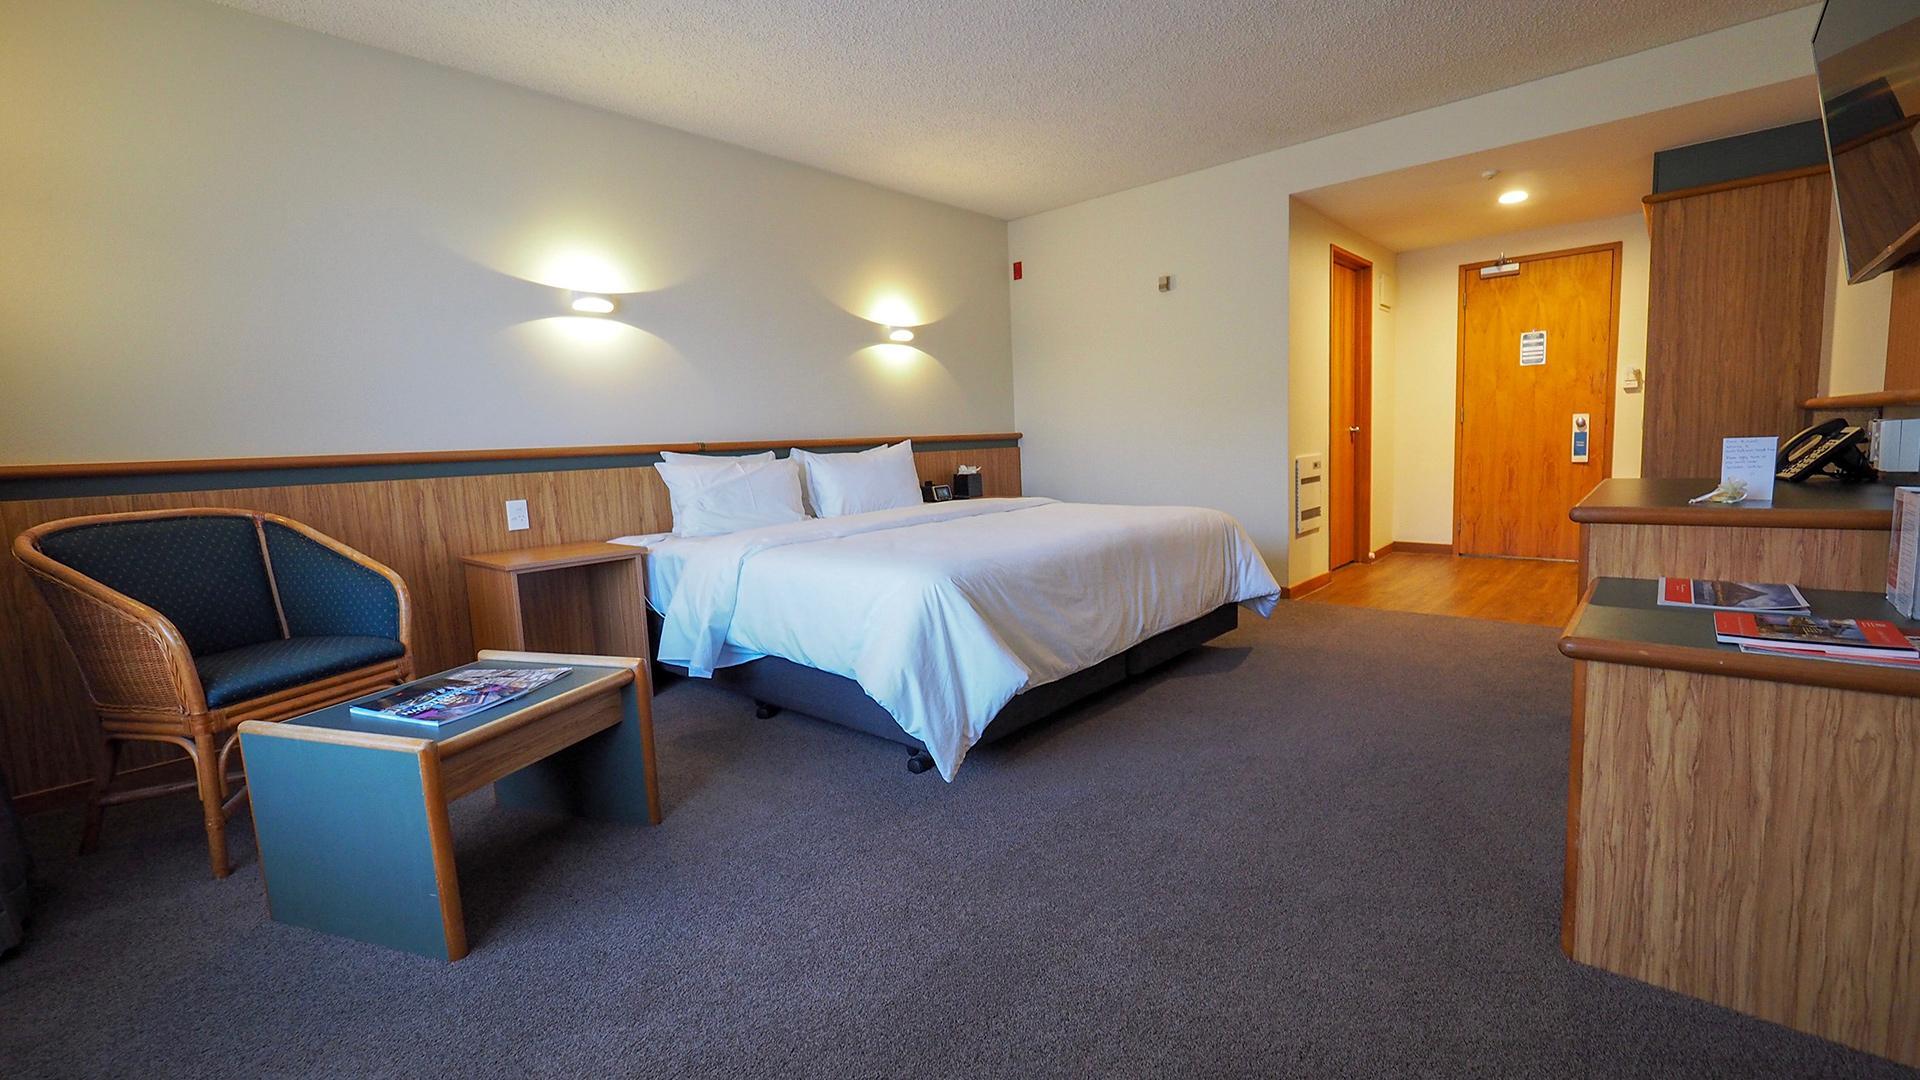 Standard Room image 1 at Swiss-Belresort Coronet Peak by null, Otago, New Zealand